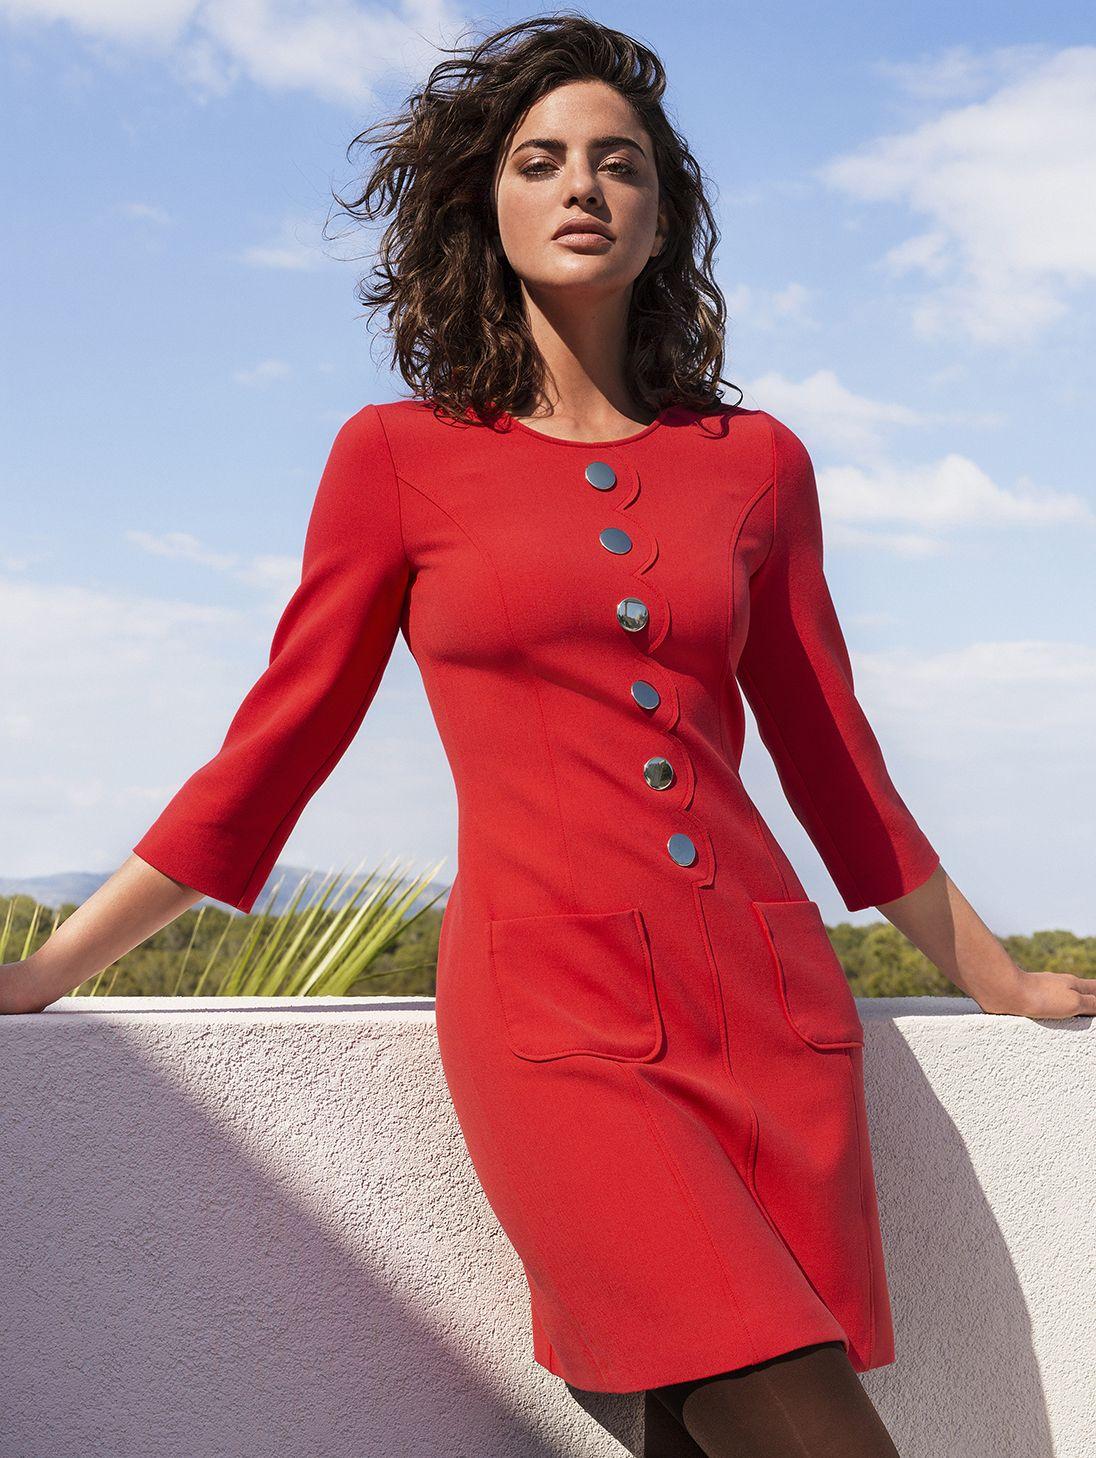 caroline biss red dress